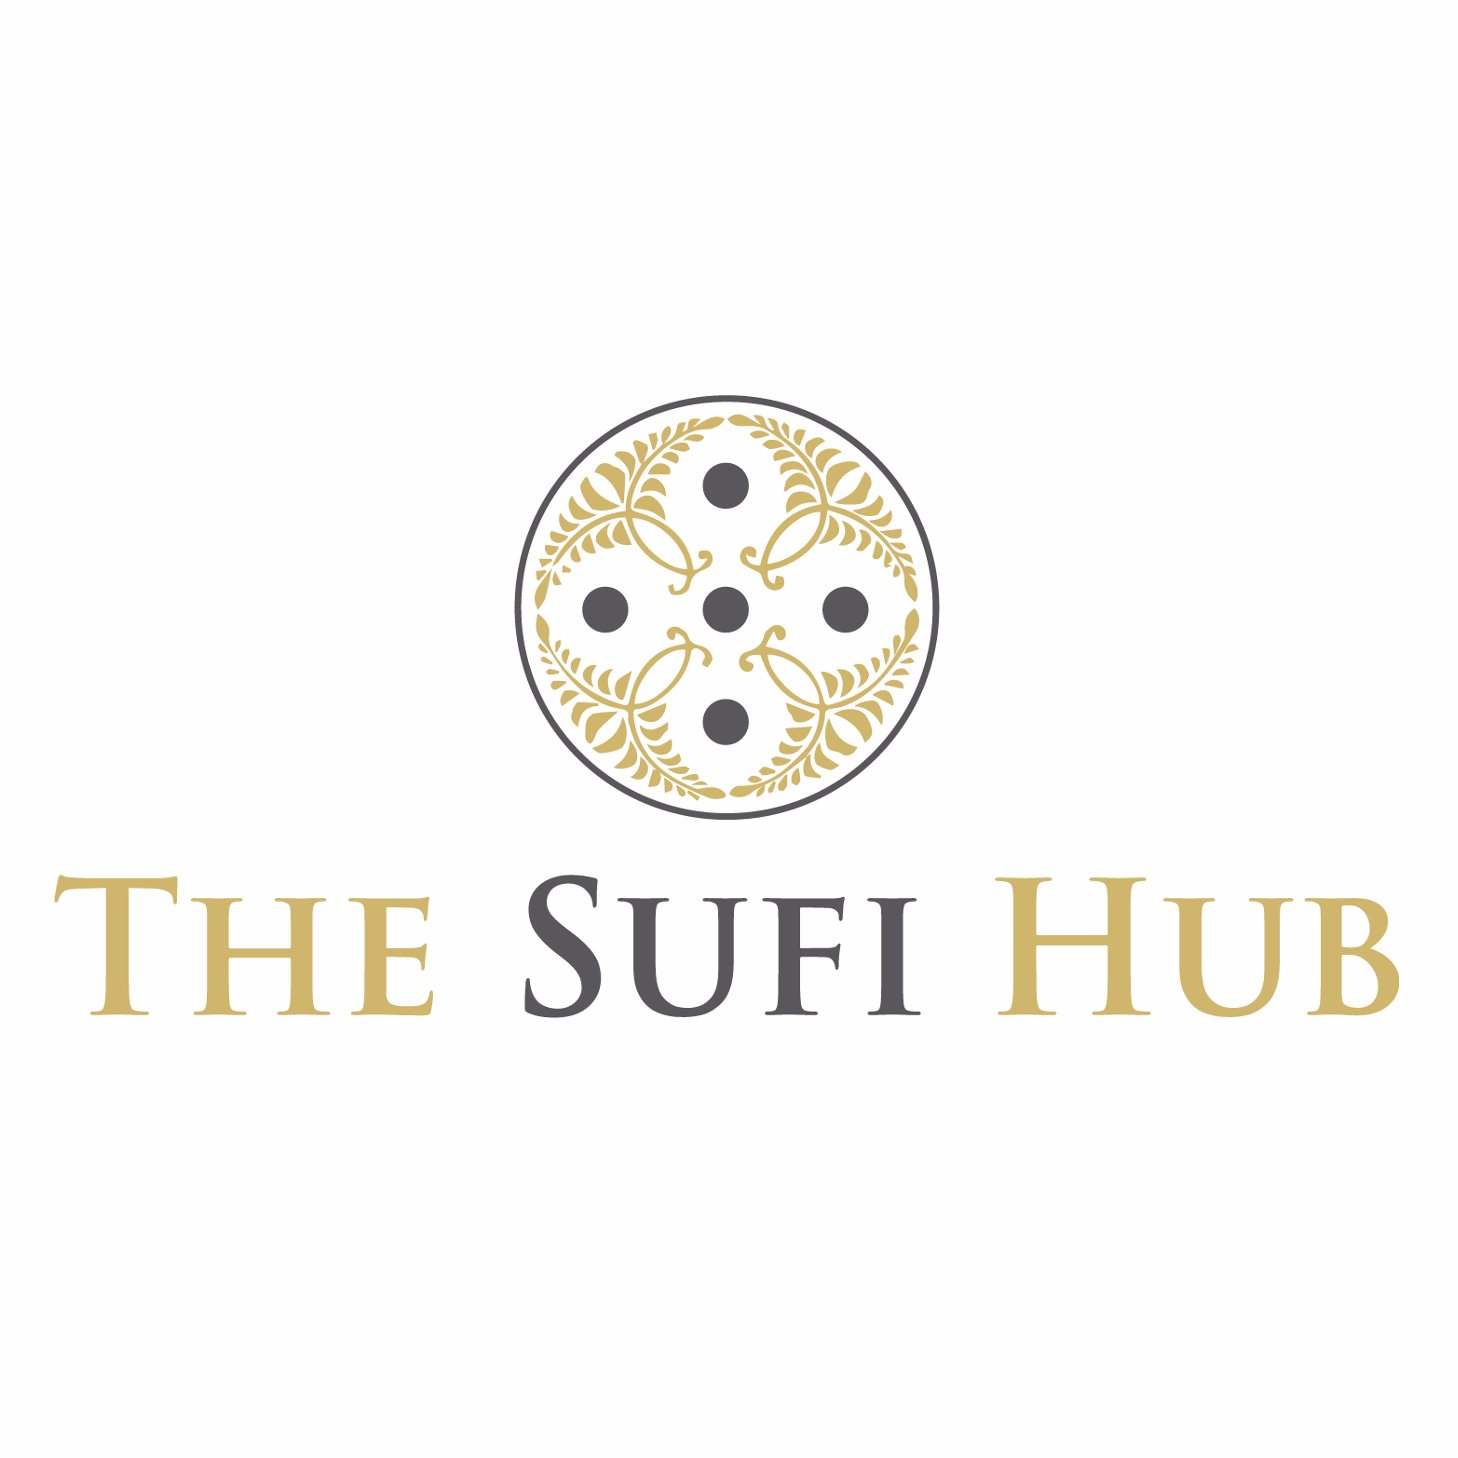 The Sufi Hub on Twitter: